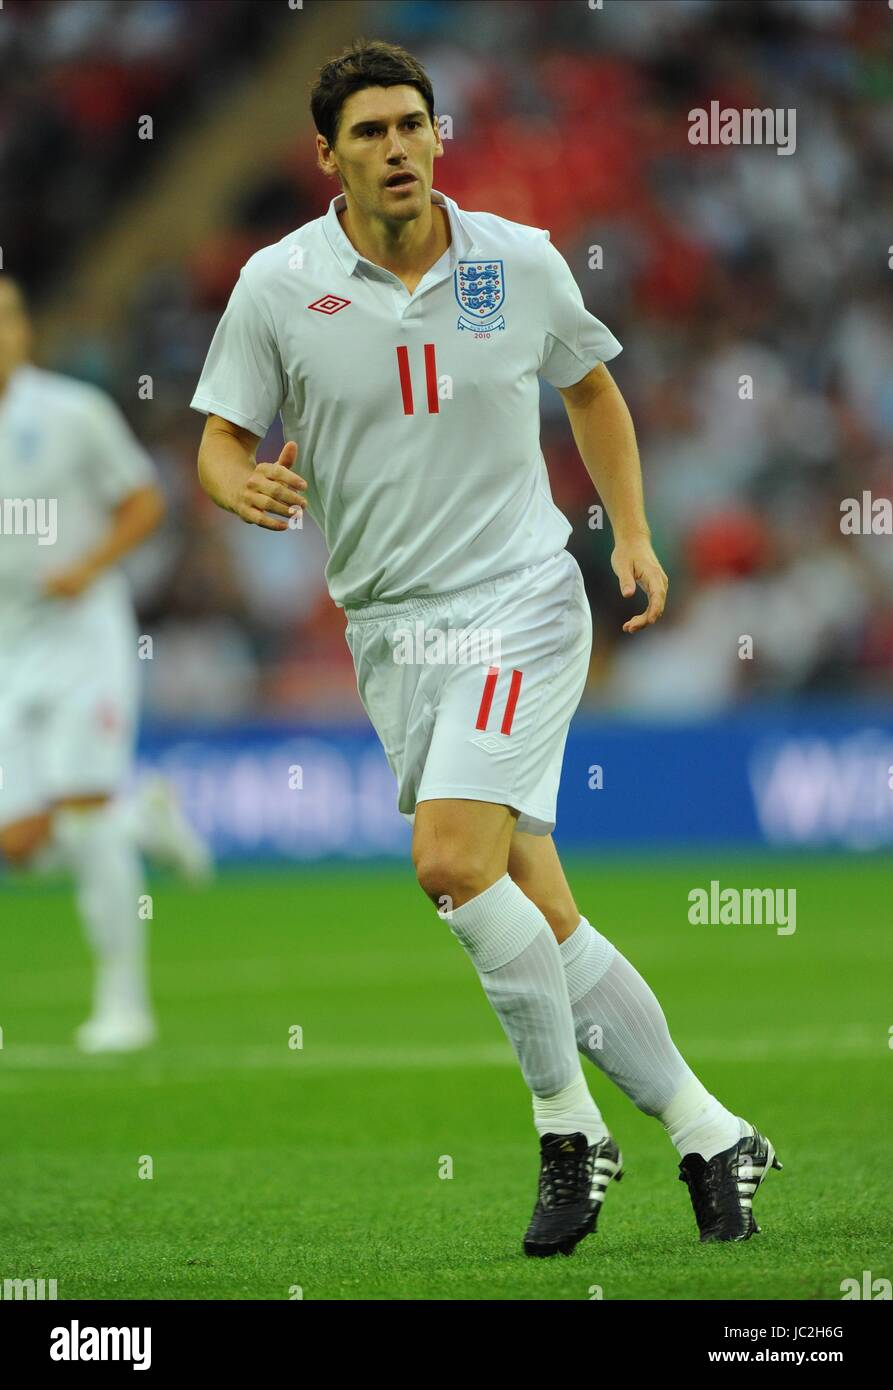 GARETH BARRY ENGLAND WEMBLEY STADIUM LONDON ENGLAND 11 August 2010 - Stock Image